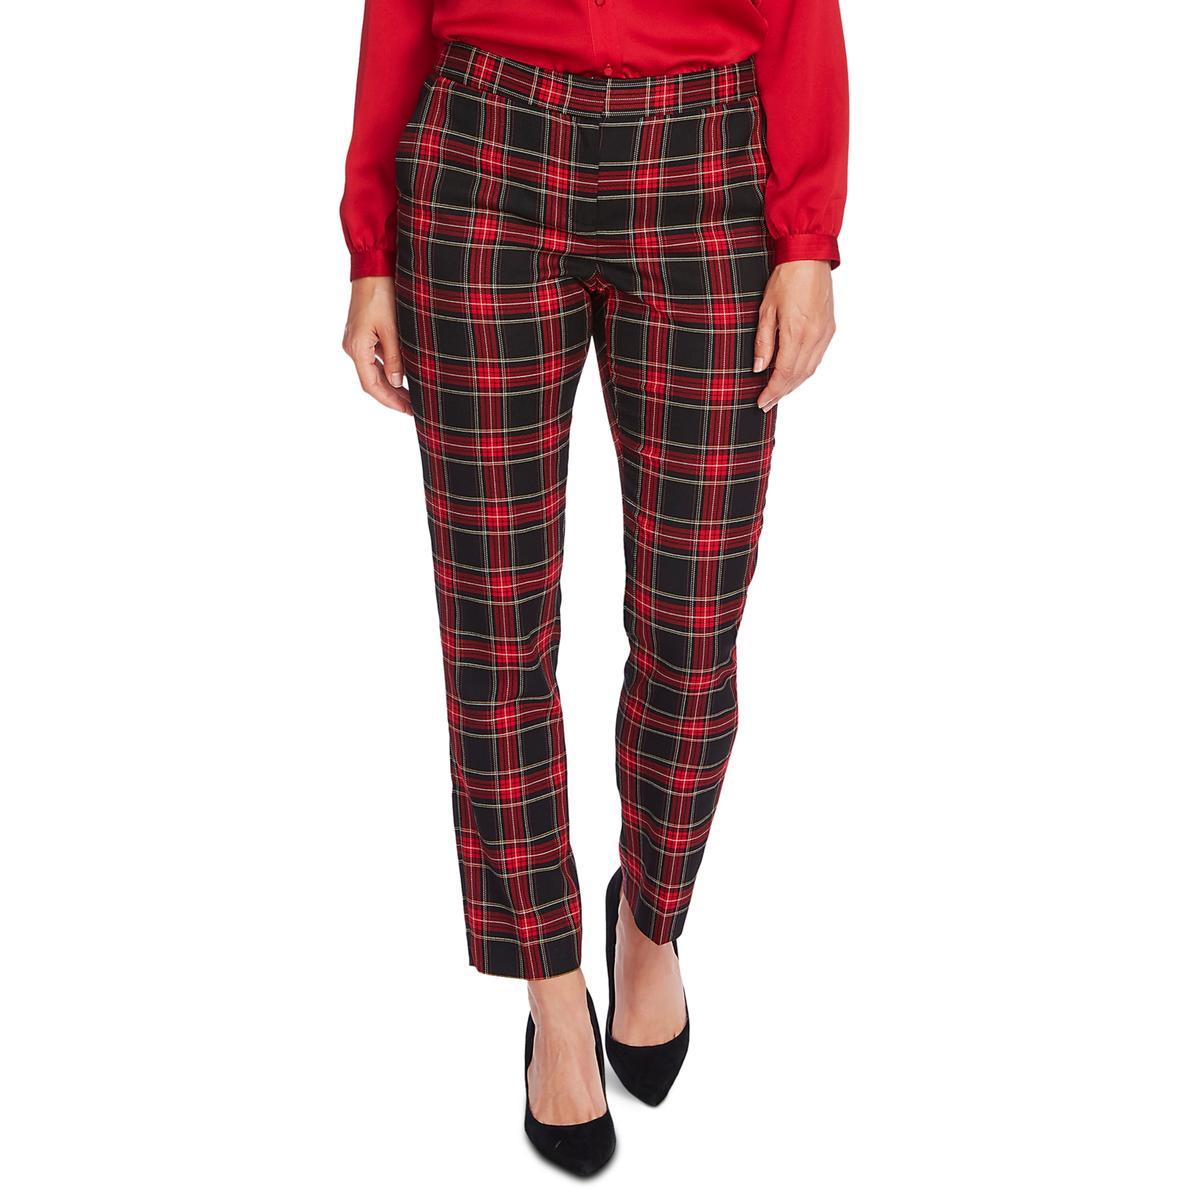 Vince Camuto Womens Holiday Tartan Plaid Ankle Sraight Pants BHFO 9661